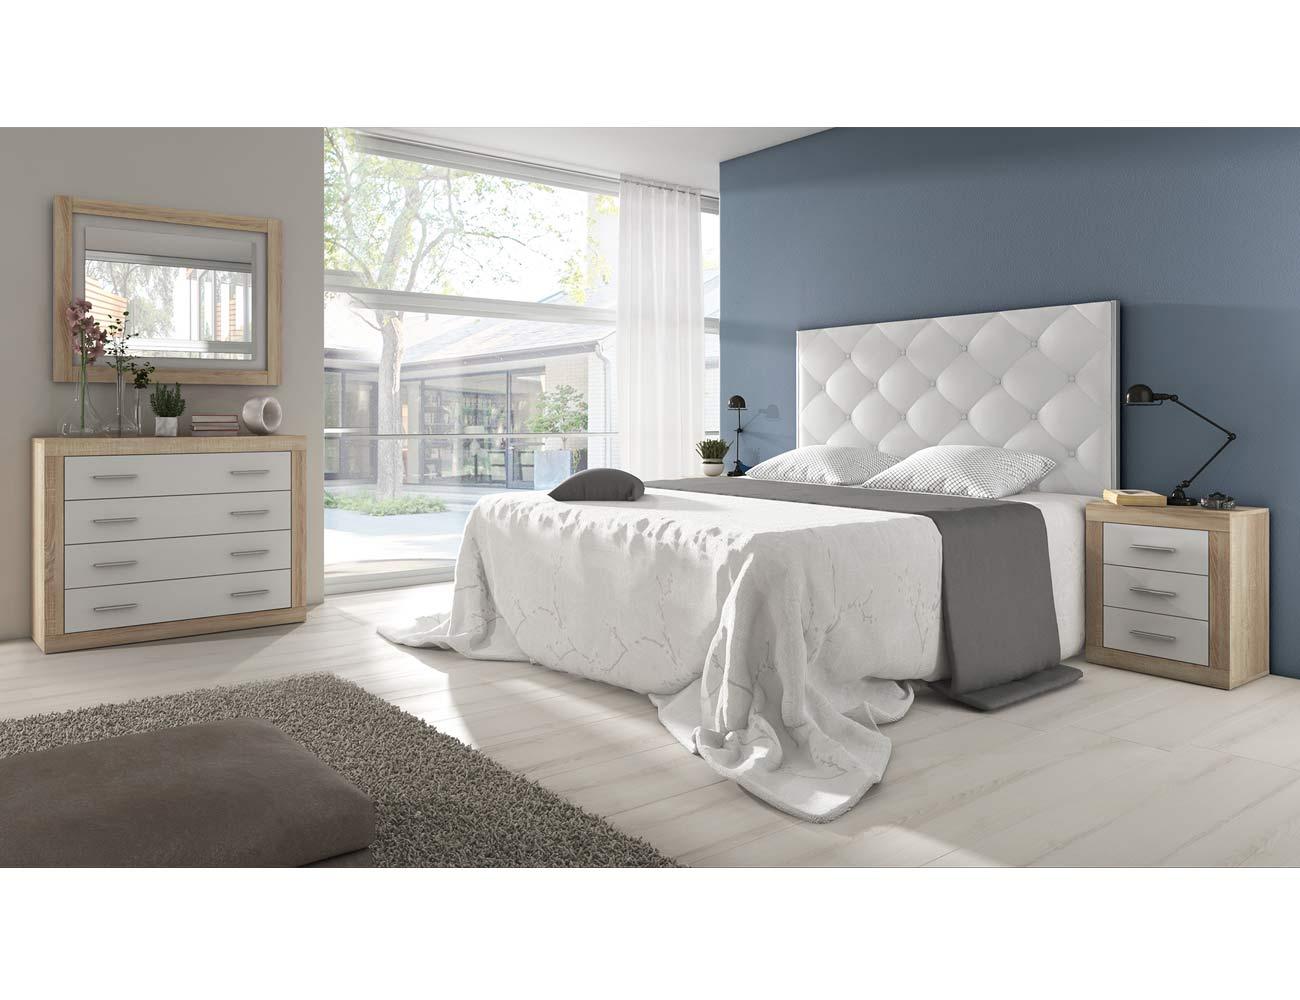 Dormitorio de matrimonio moderno con cabecero en polipiel for Muebles de matrimonio